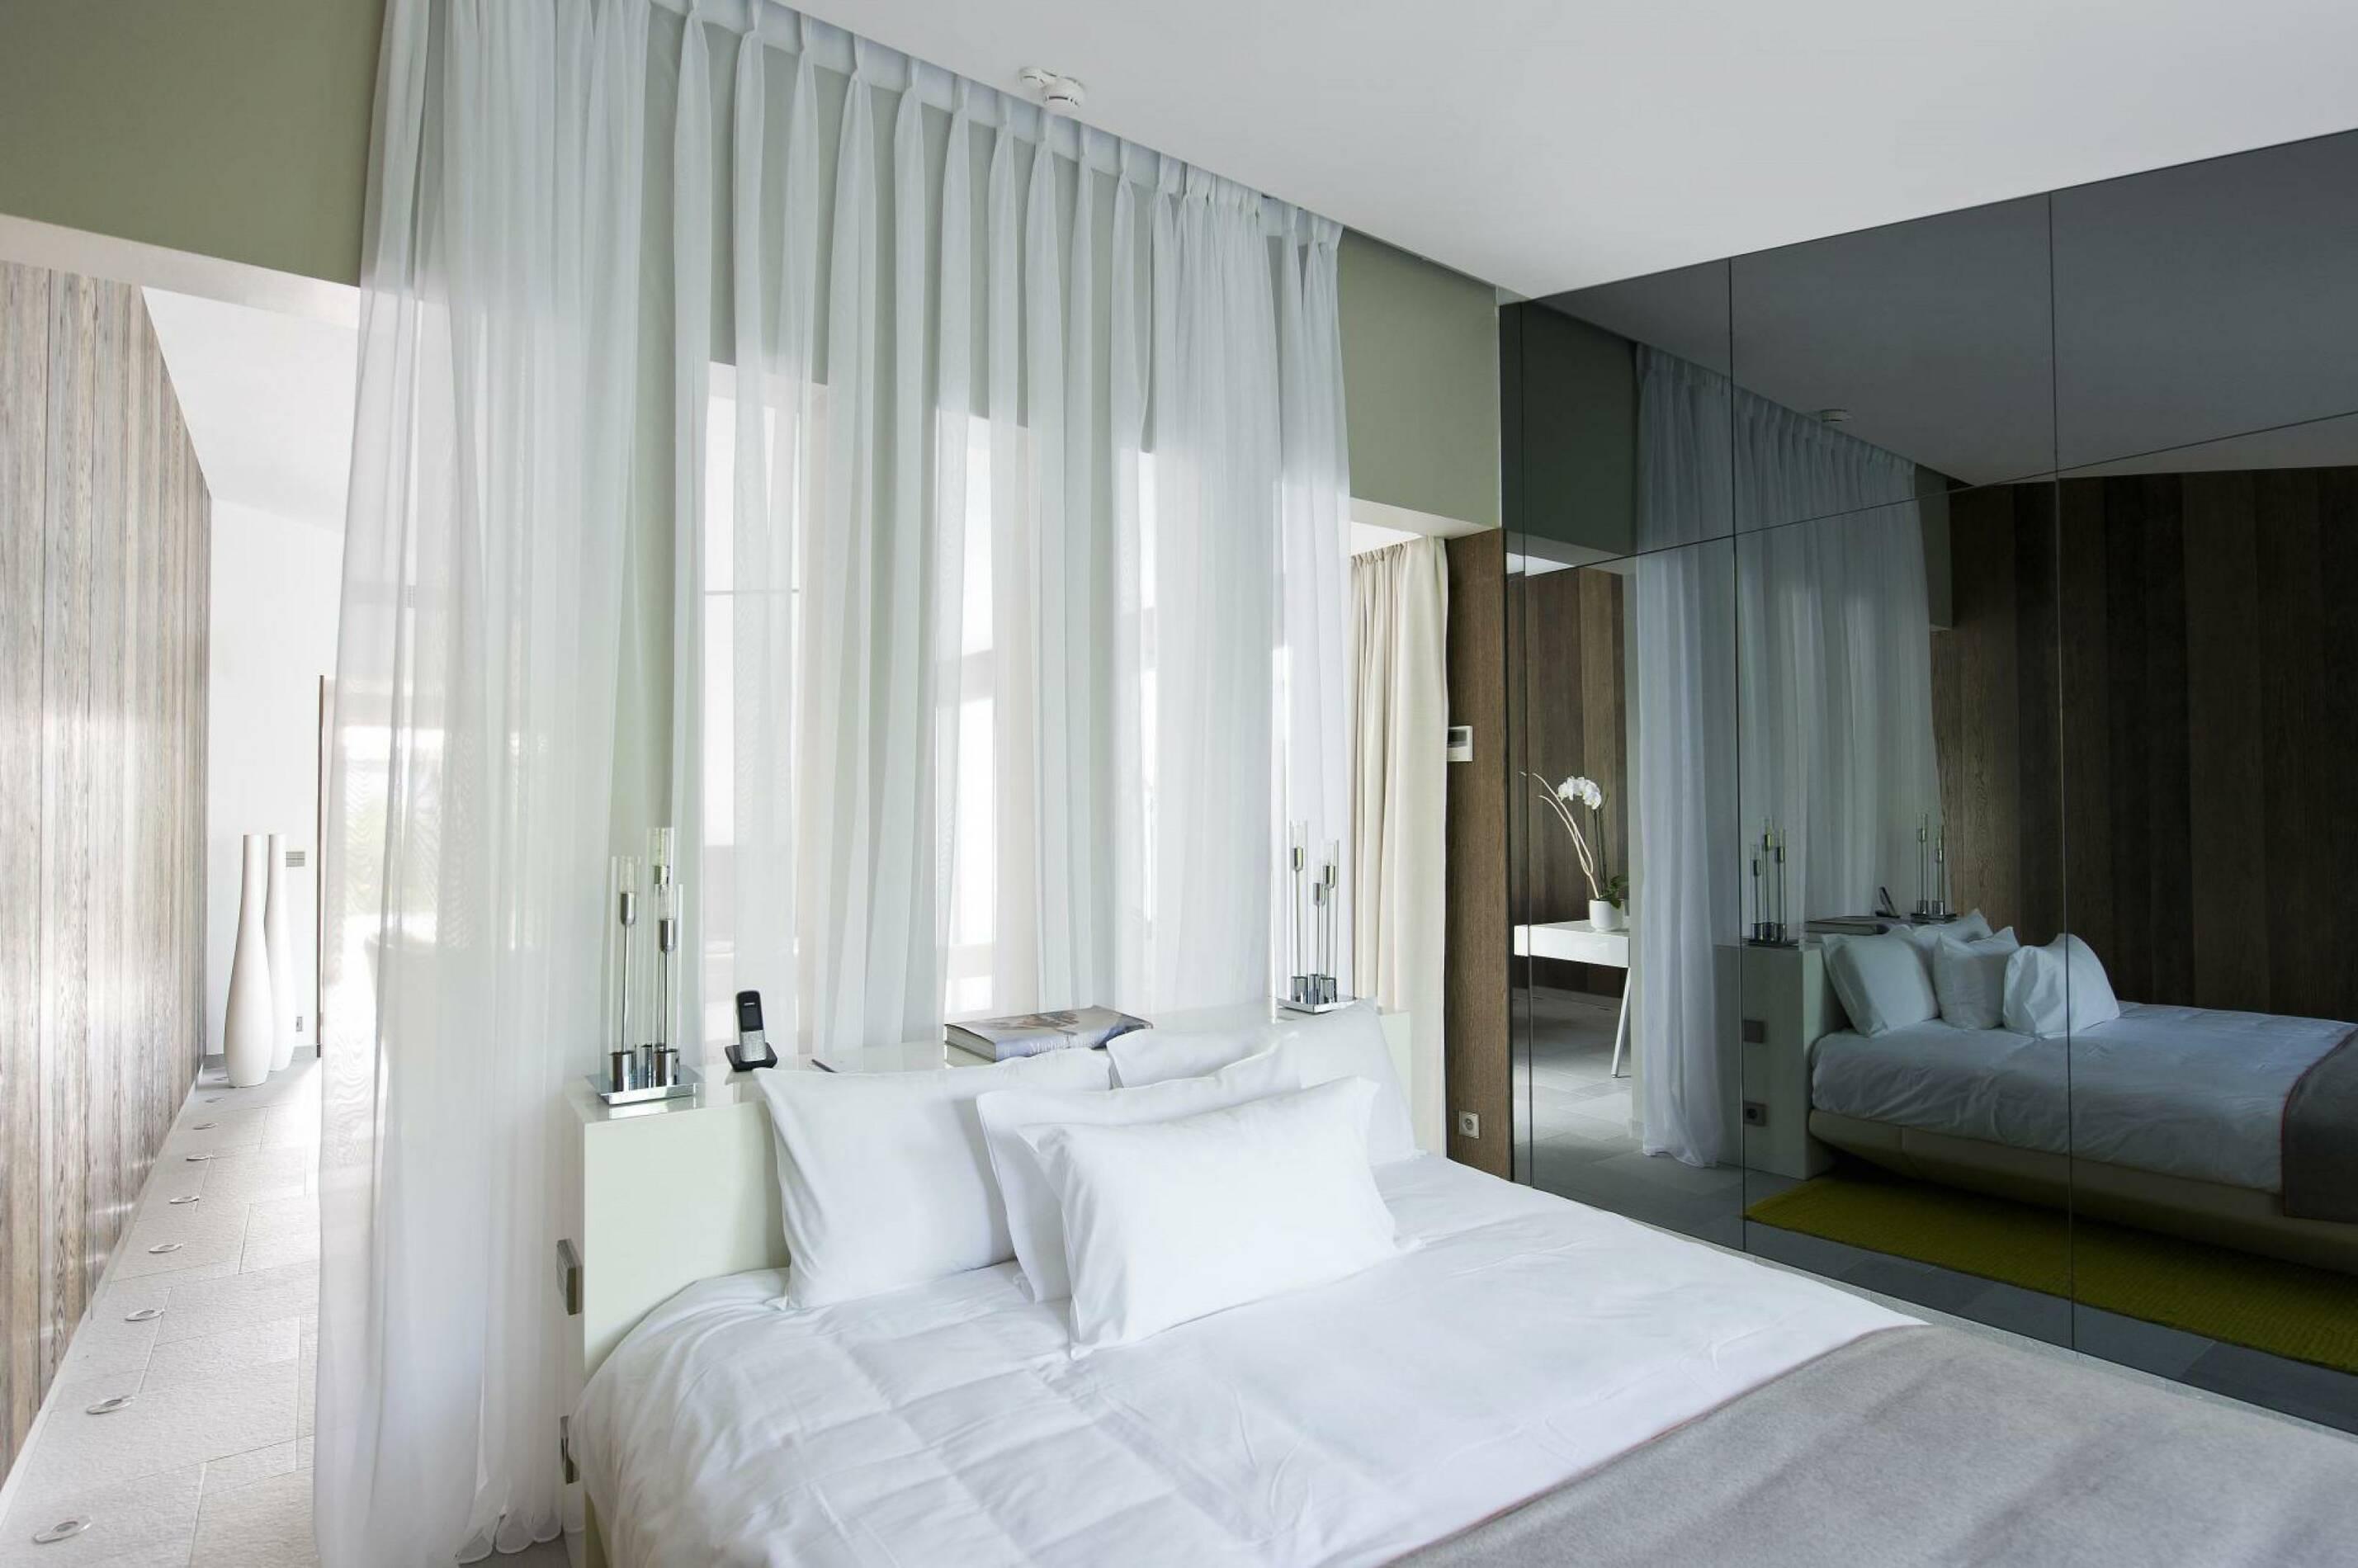 Hotel Sezz Villa Chambre Saint Tropez